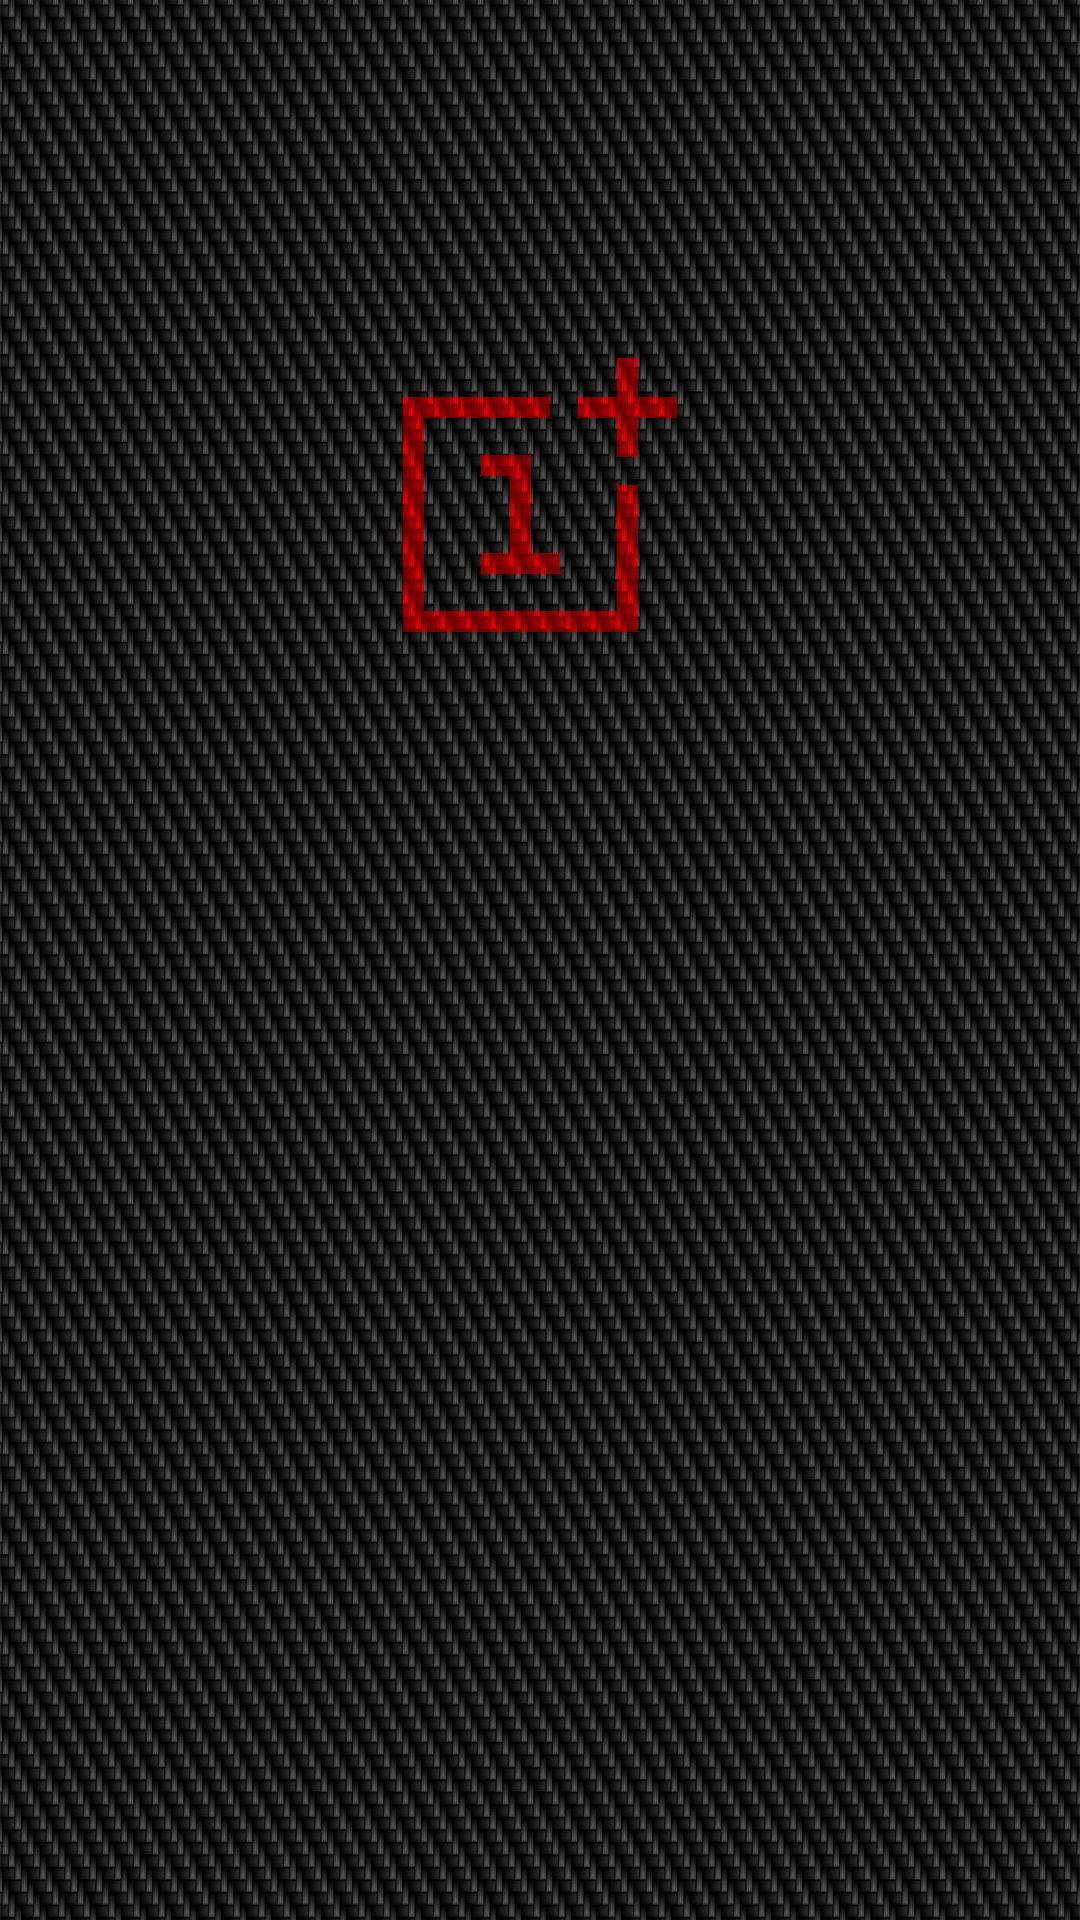 OnePlus Carbon Wallpaper   OnePlus Community 1080x1920